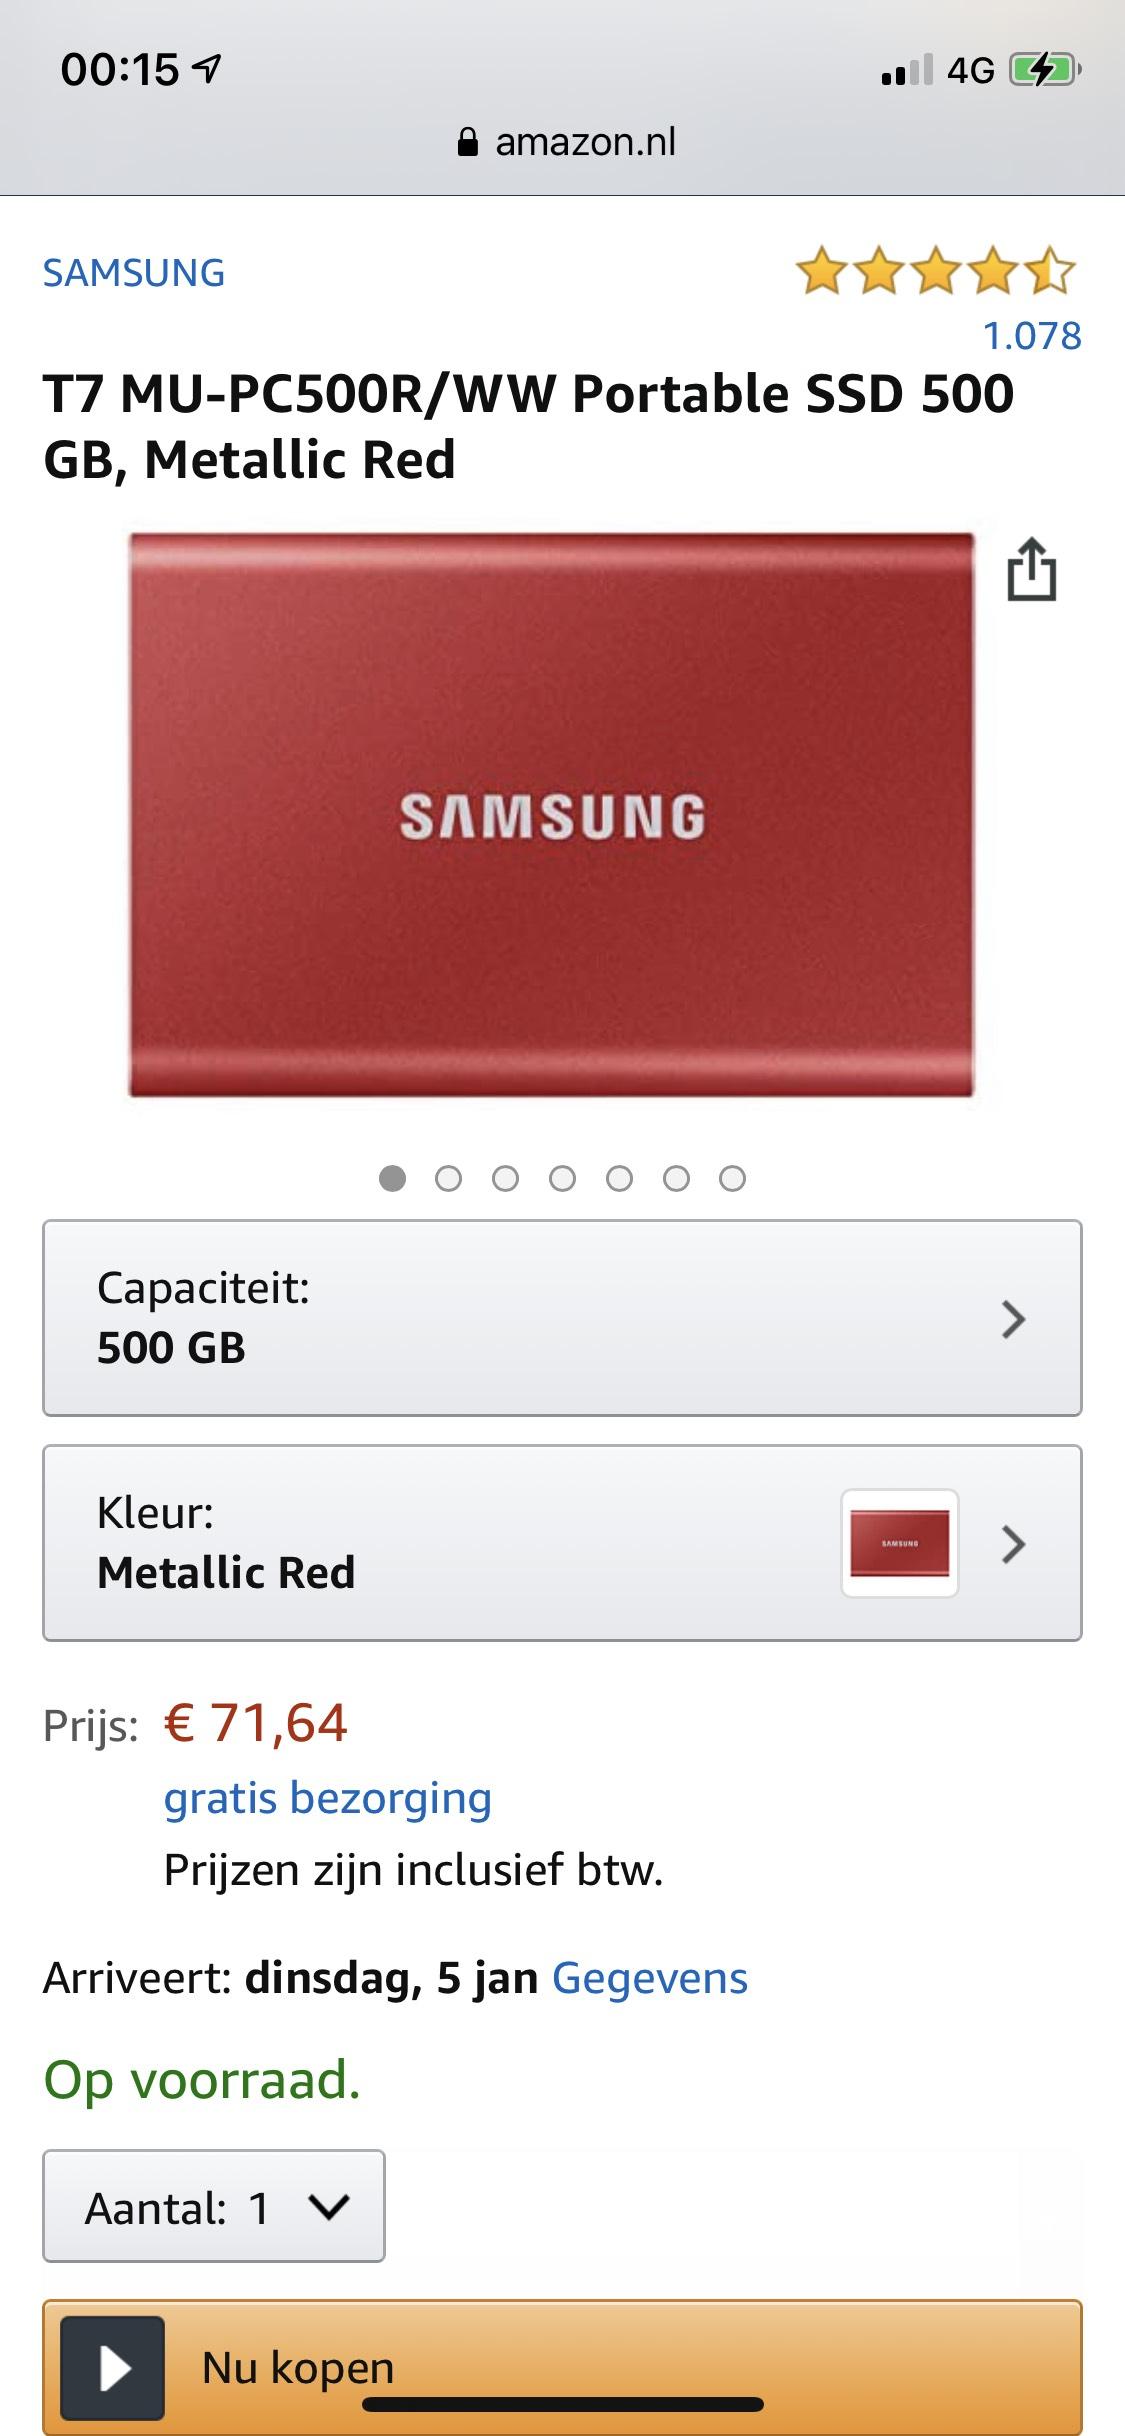 Samsung T7 portable SSD usb-c 500Gb